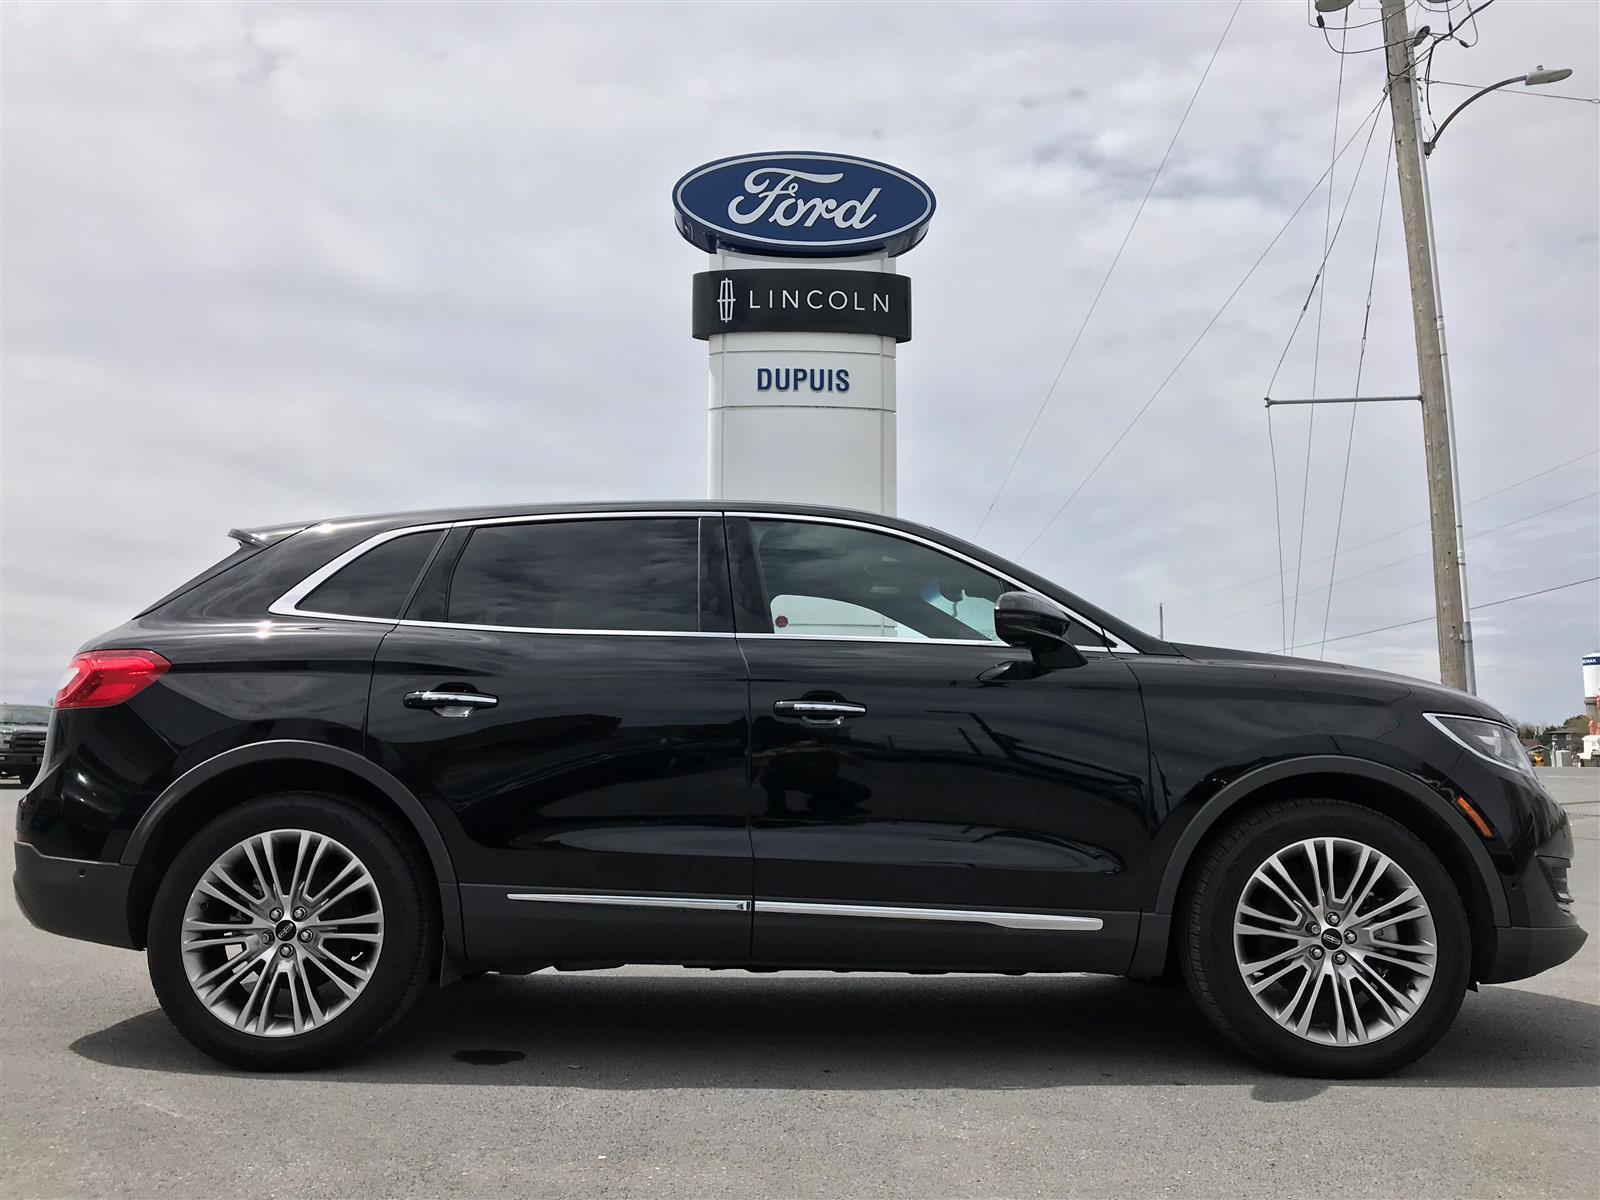 Lincoln Suv 2018 >> 2018 Lincoln Mkx Reserve Awd Black 3 7l V6 Dohc 24v